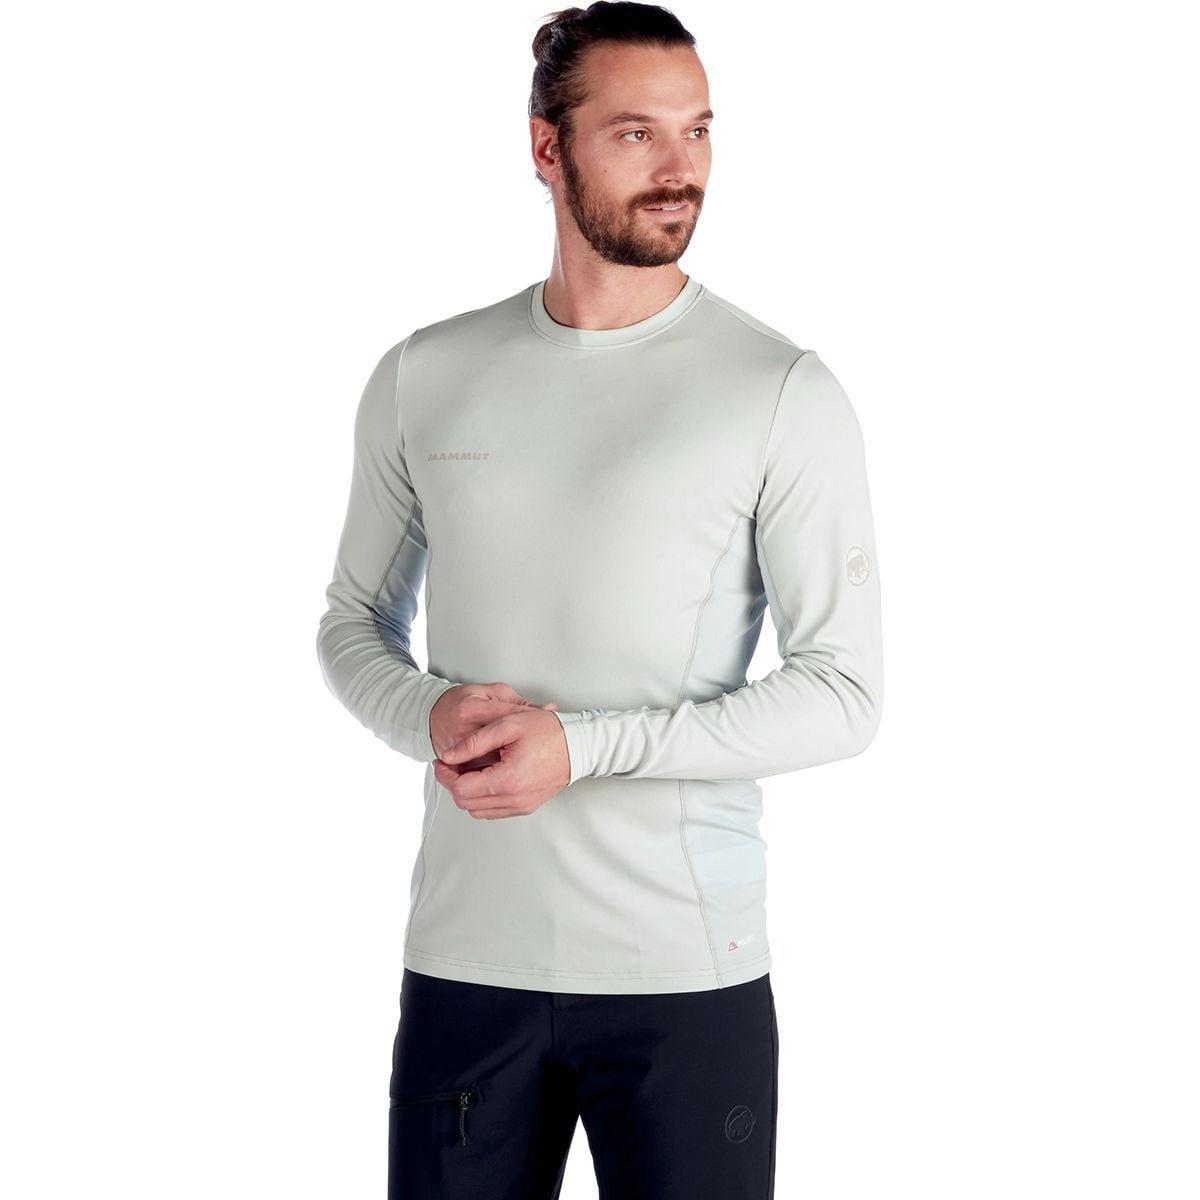 Sertig Long-Sleeve Shirt - Men